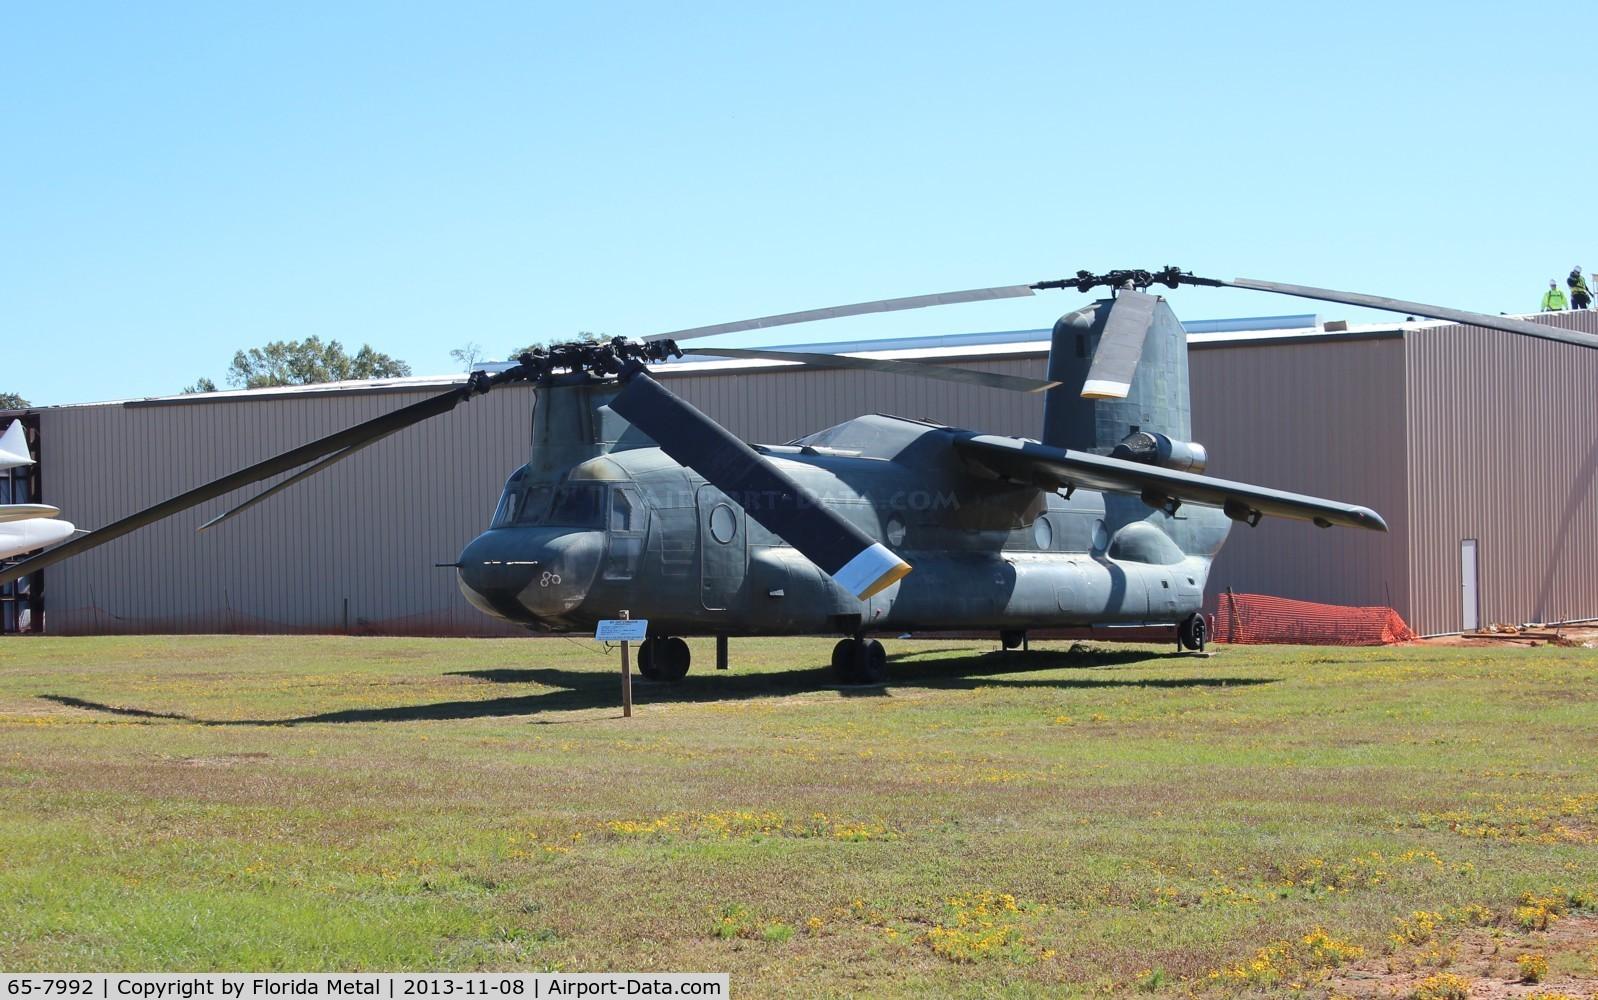 65-7992, Boeing Vertol CH-47A Chinook C/N B.164, CH-47A Chinook